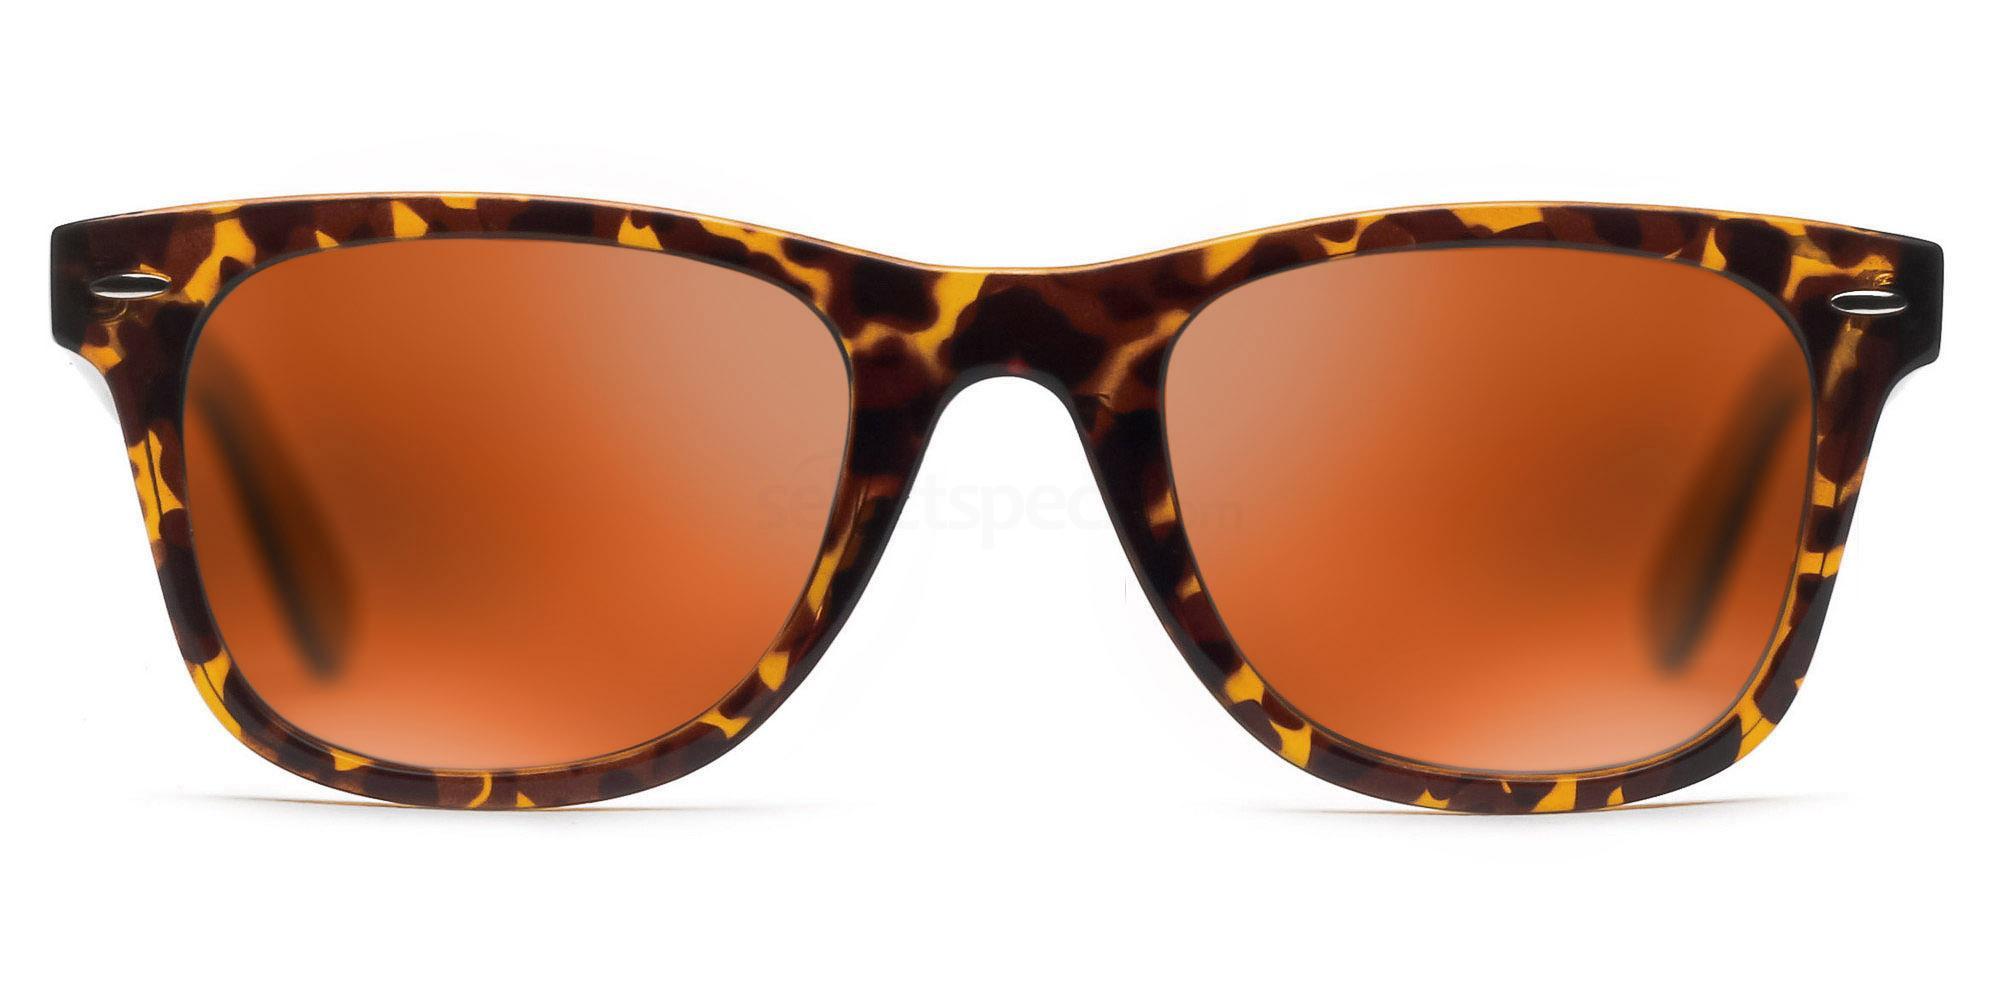 C04 Polarized Grey with Orange Mirror P2429 - Havana (Mirrored Polarized) Sunglasses, Savannah